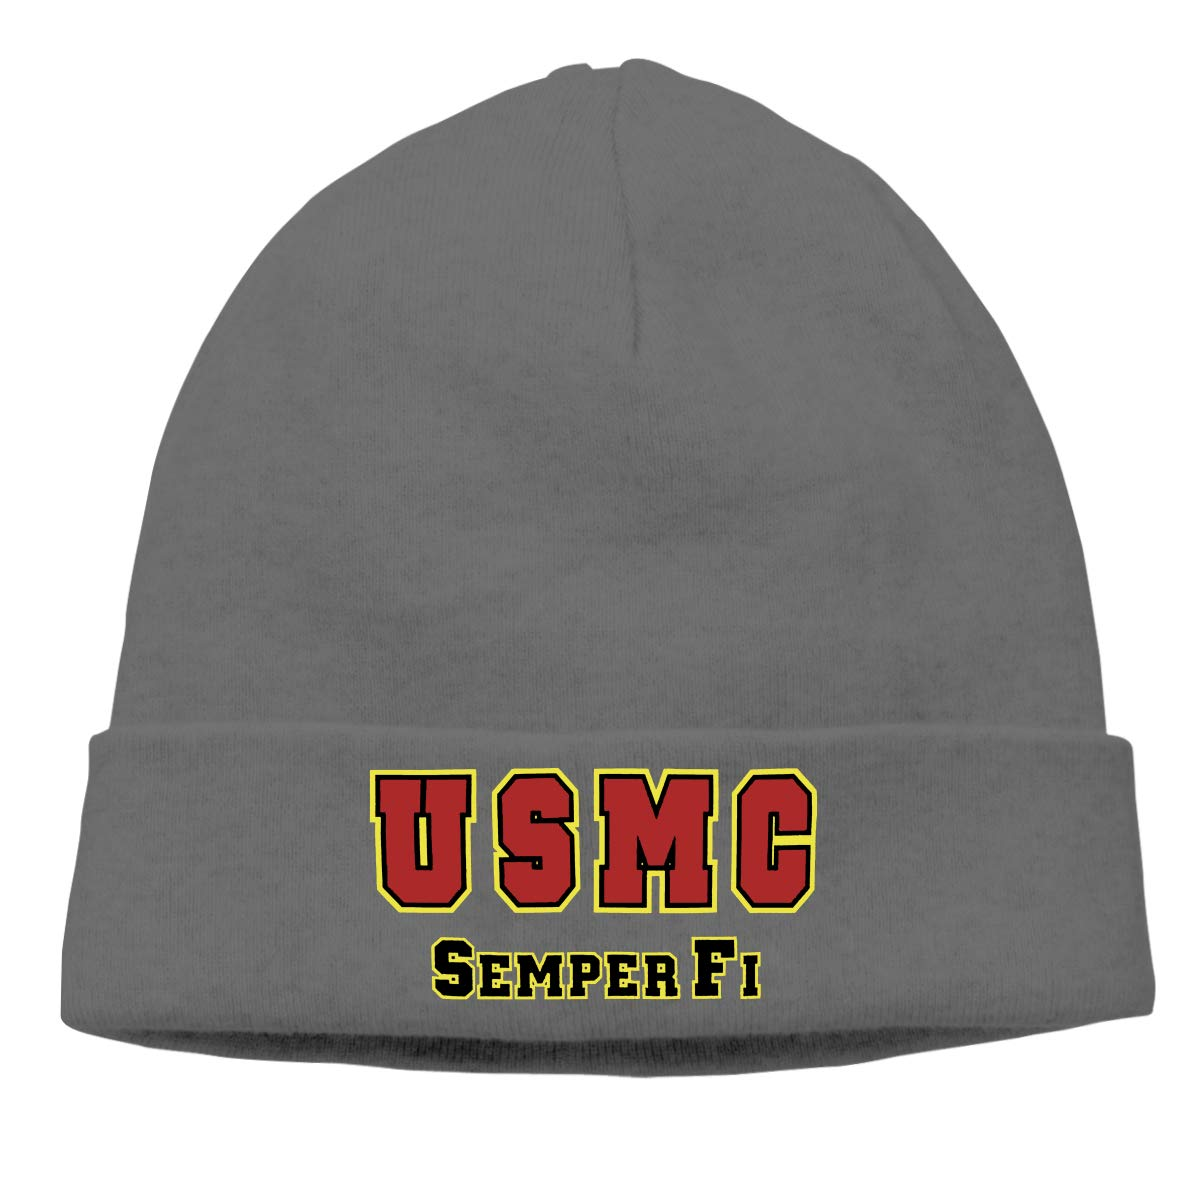 c51f8401d02 Amazon.com  TIANSHADEBIEGEN U S Marine Corps Semper Fi Beanie Hat Knit Cap  Winter Unisex Skully Hat  Clothing